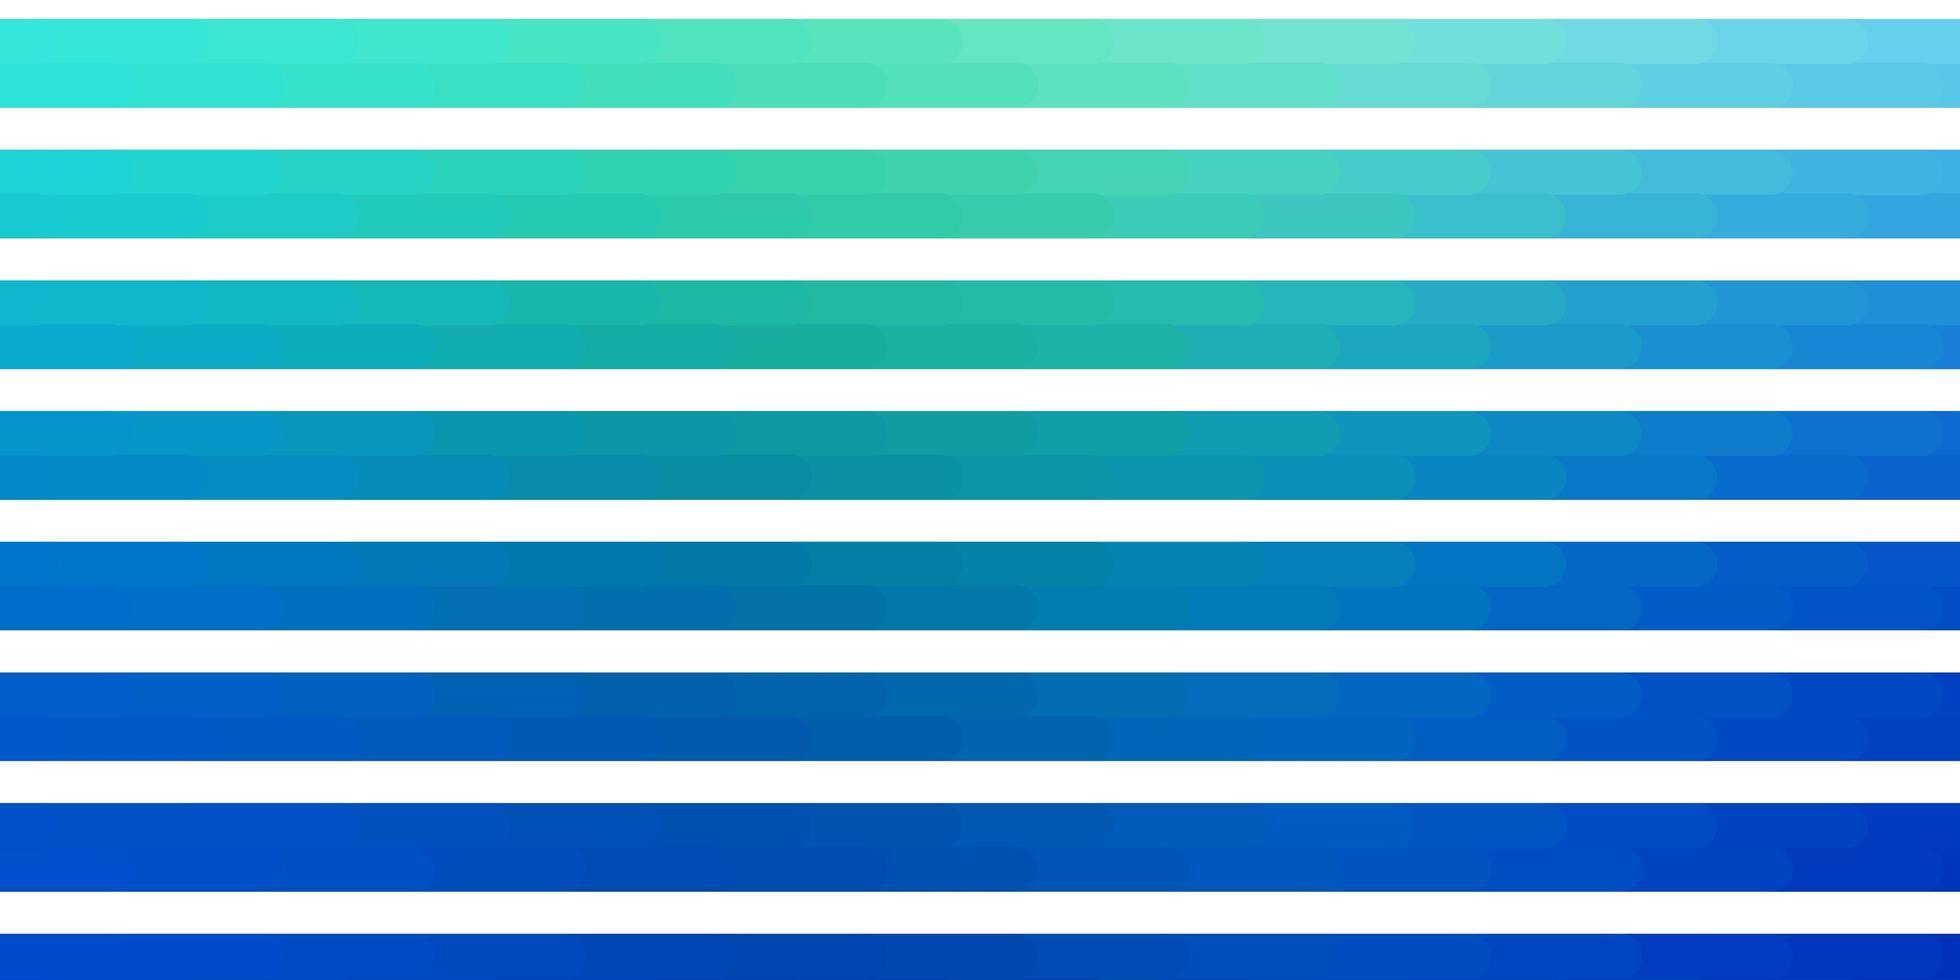 plantilla azul claro, verde con líneas. vector